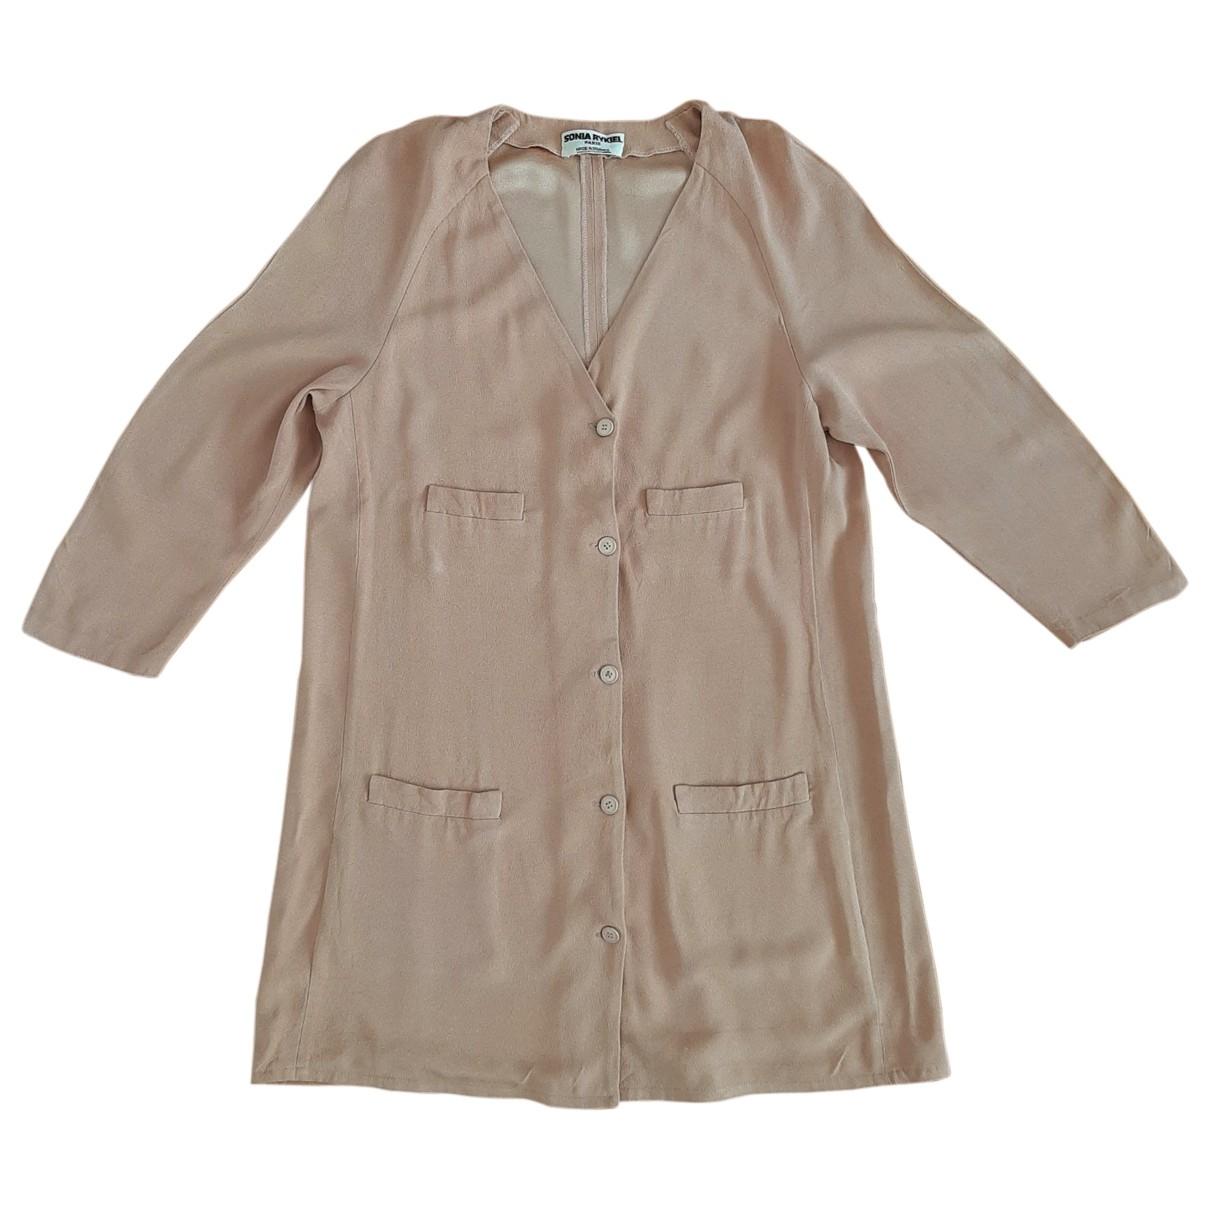 Sonia Rykiel \N Pink dress for Women 40 FR